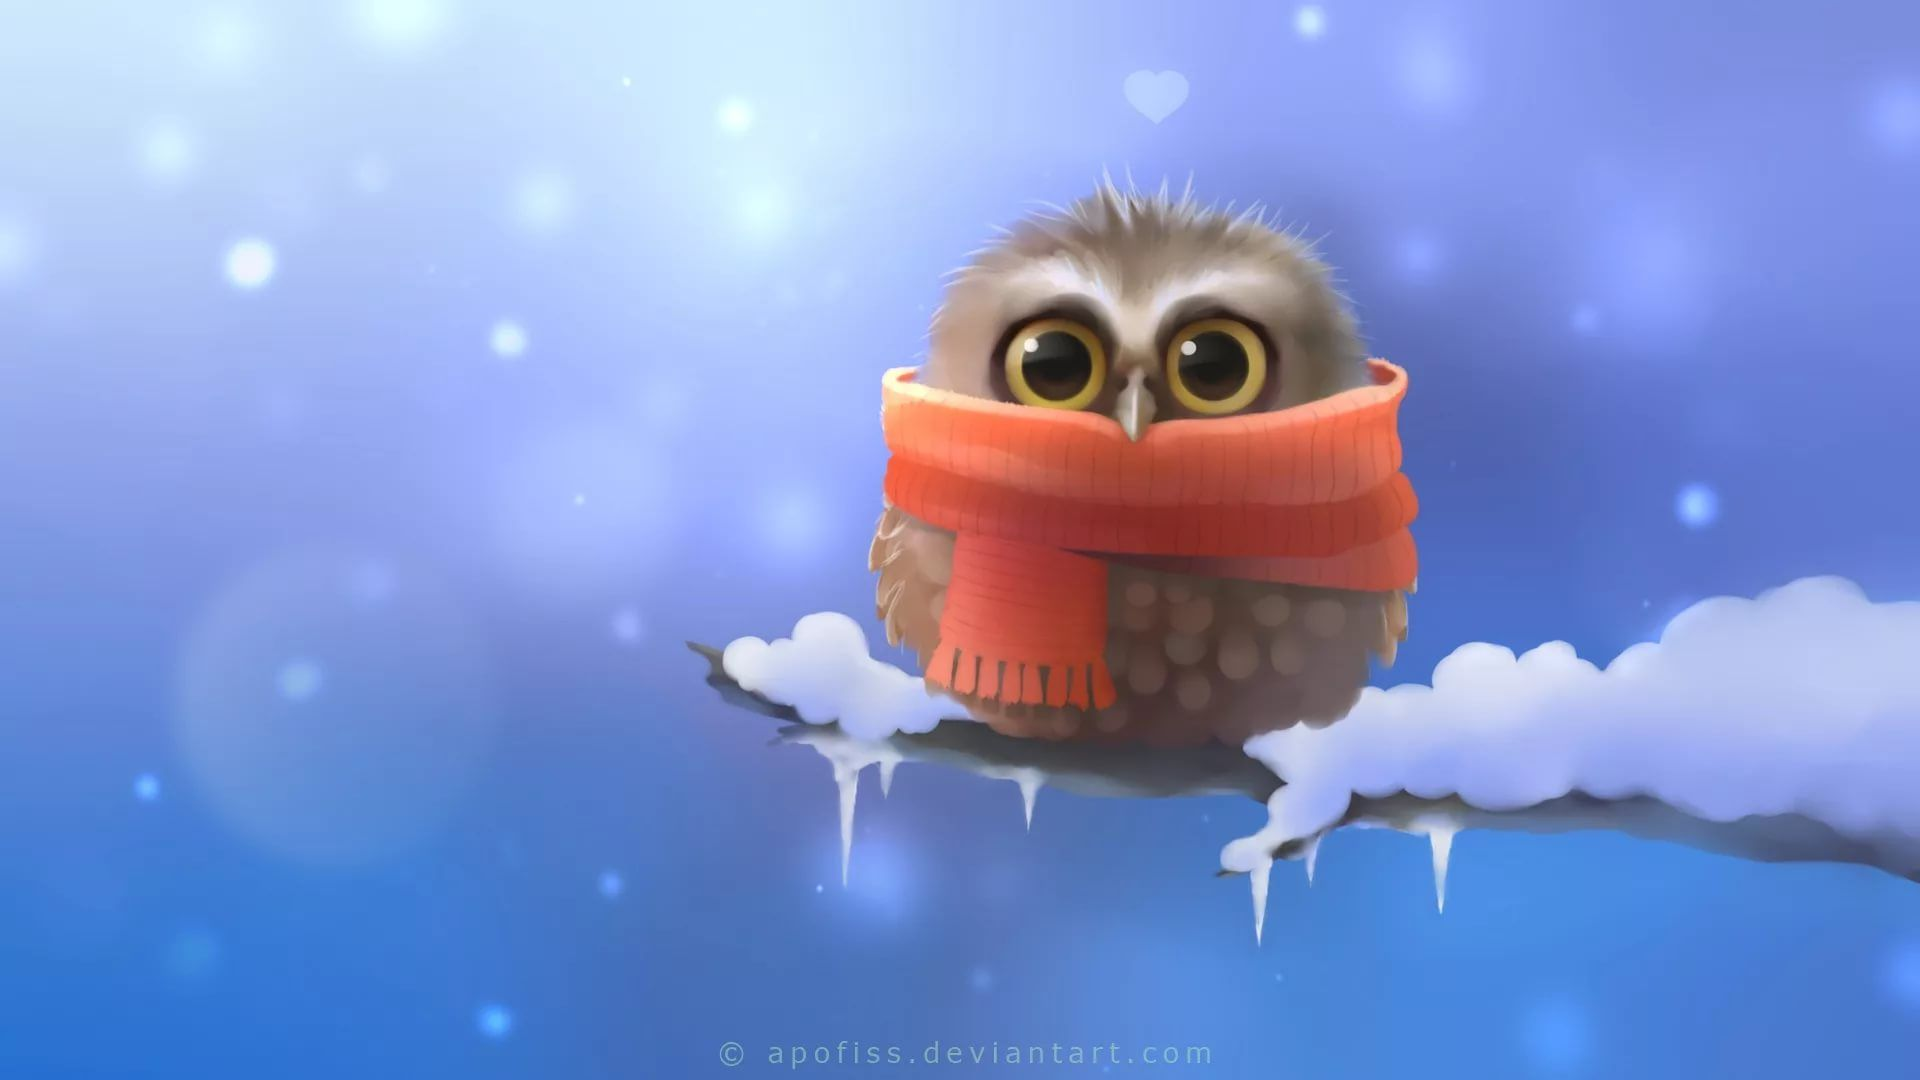 Cute Owl Wallpaper Theme